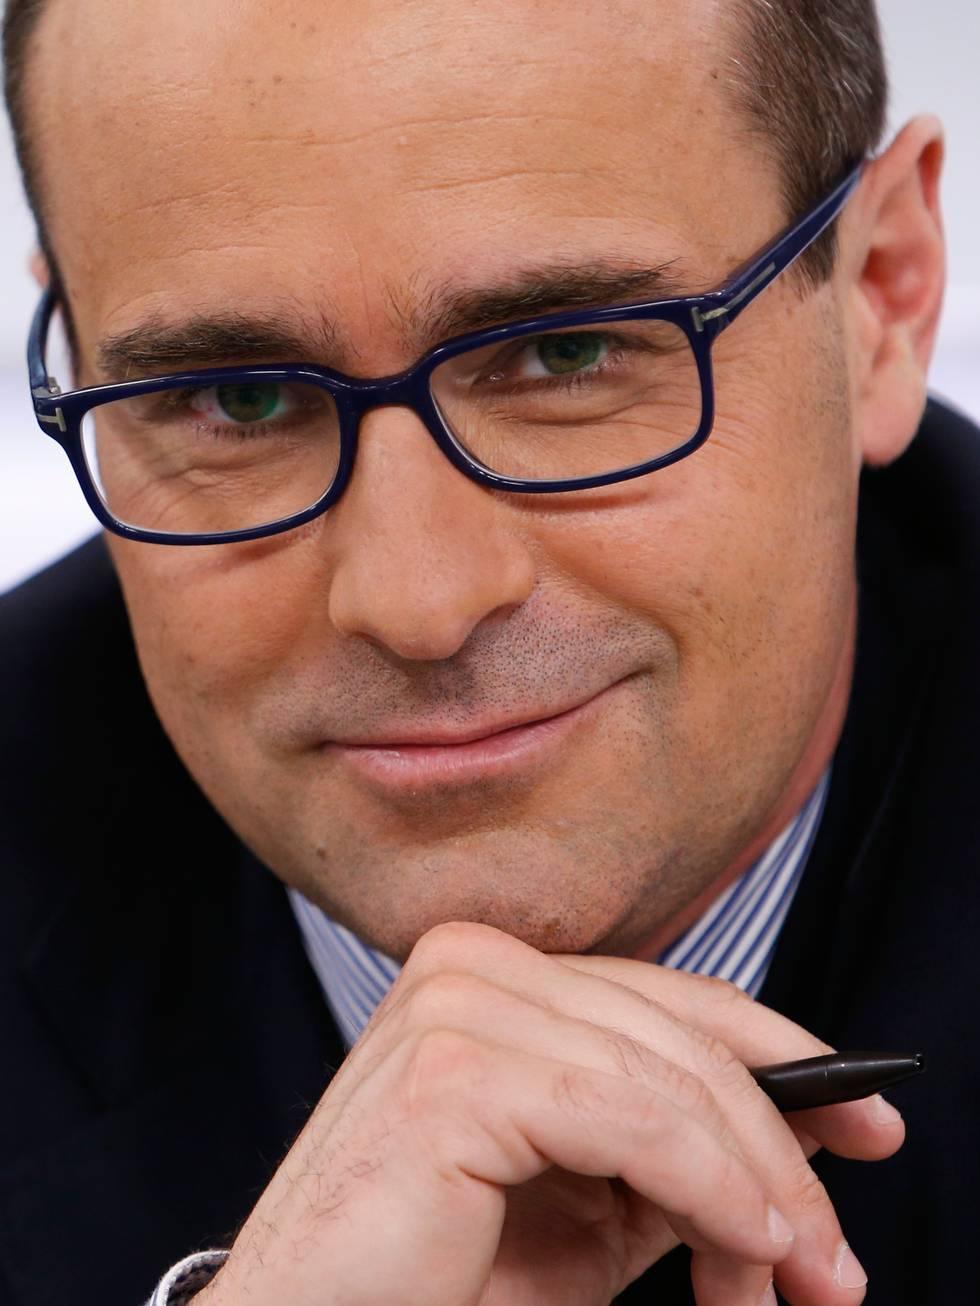 Massimiliano Herber